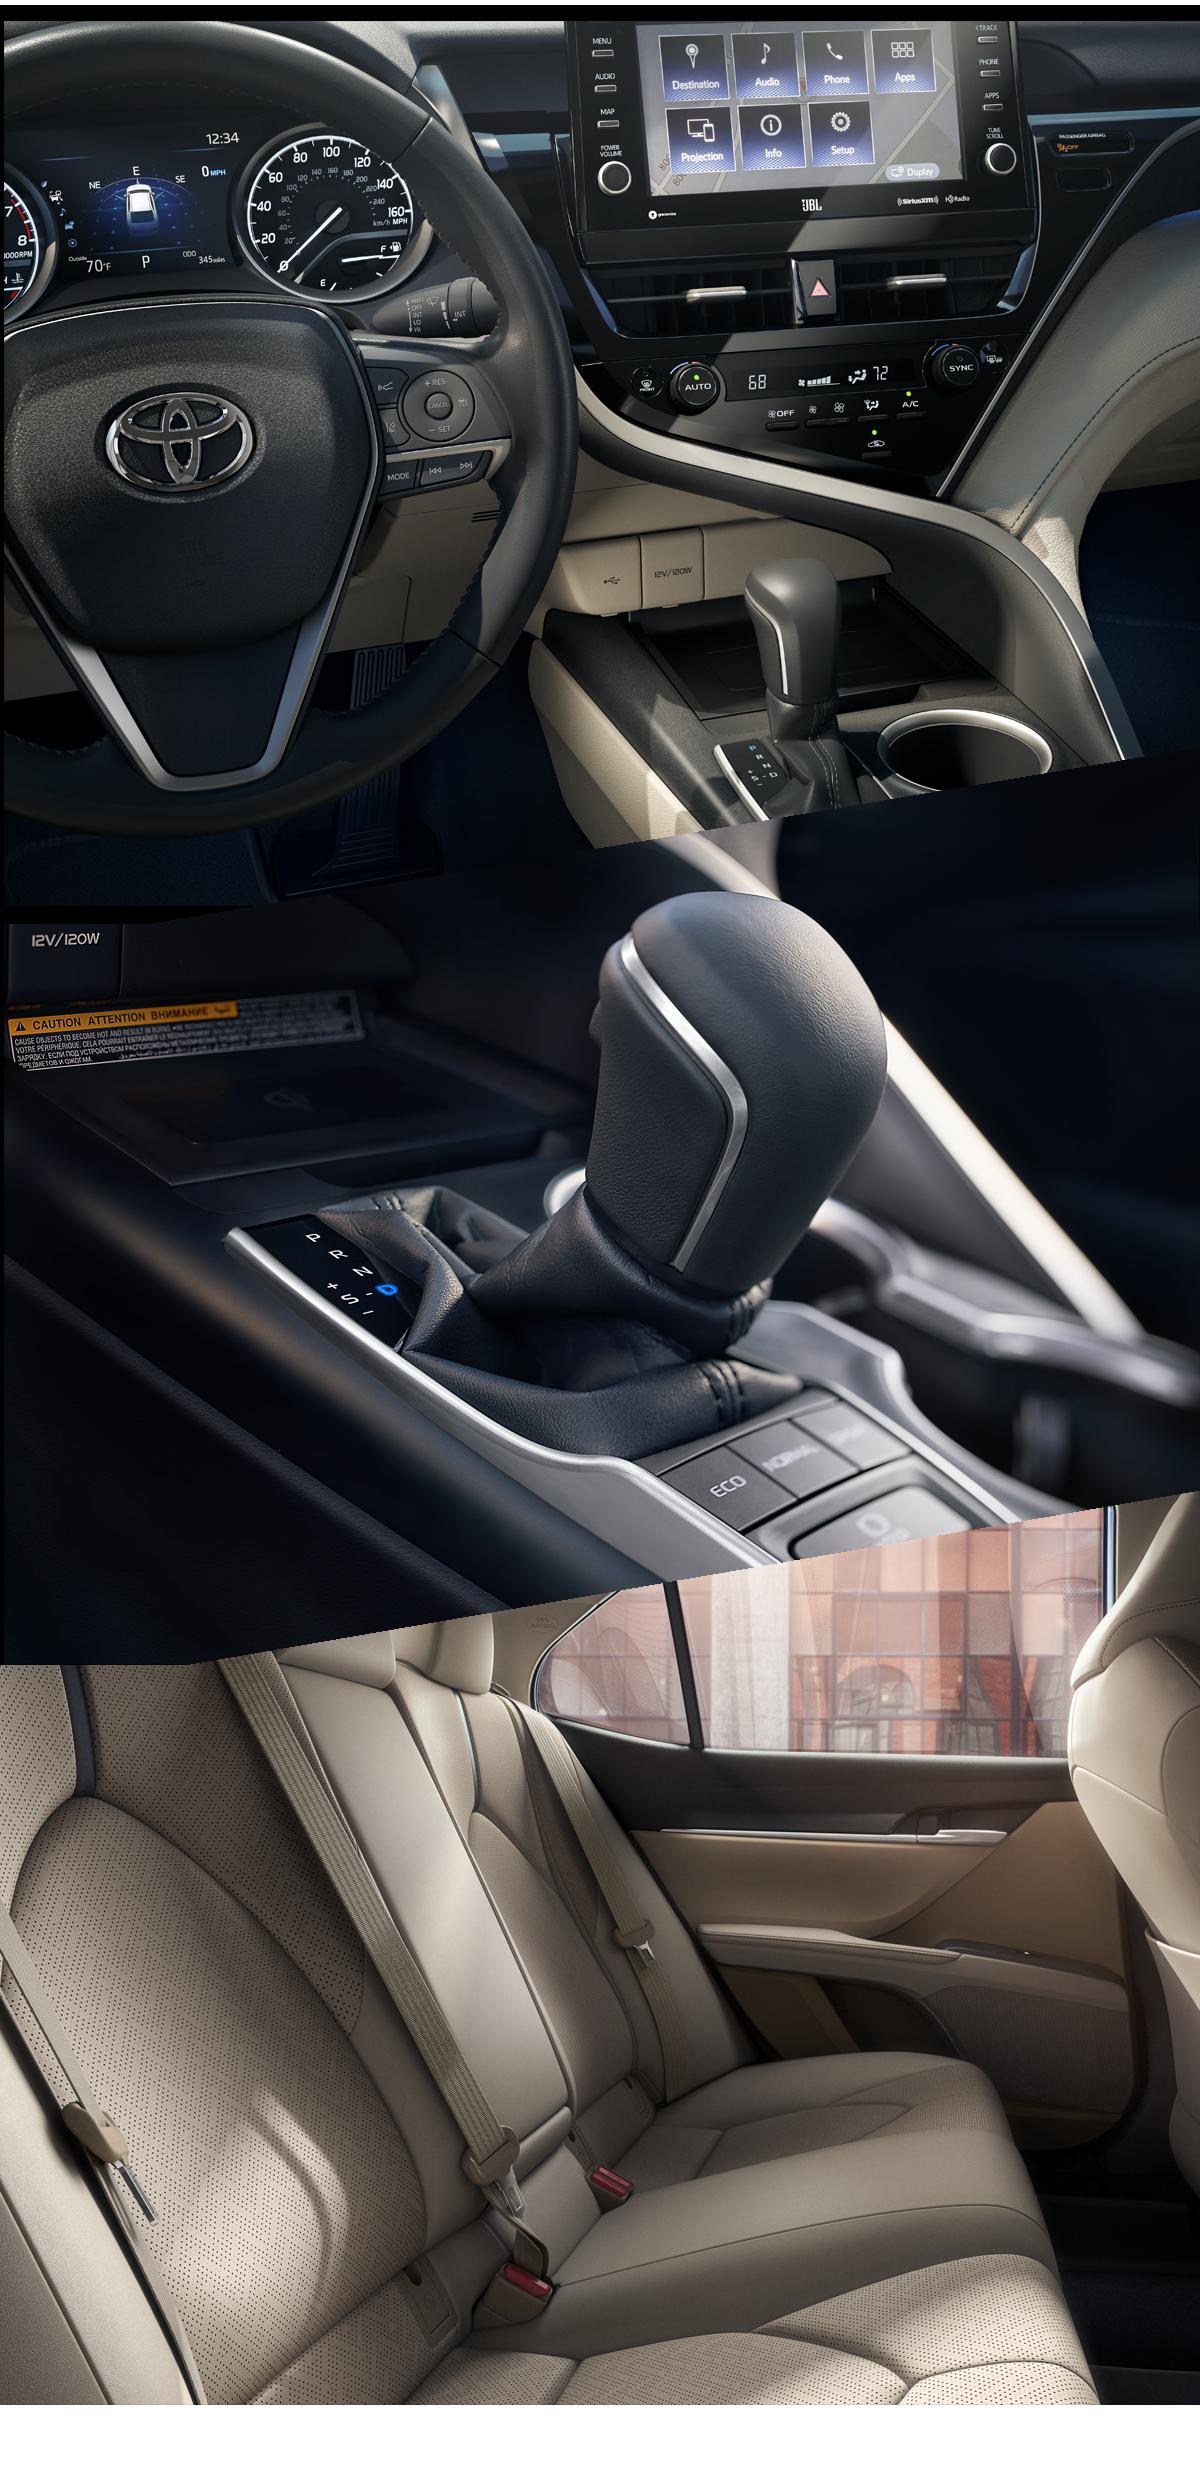 2021 Toyota Camry Interior